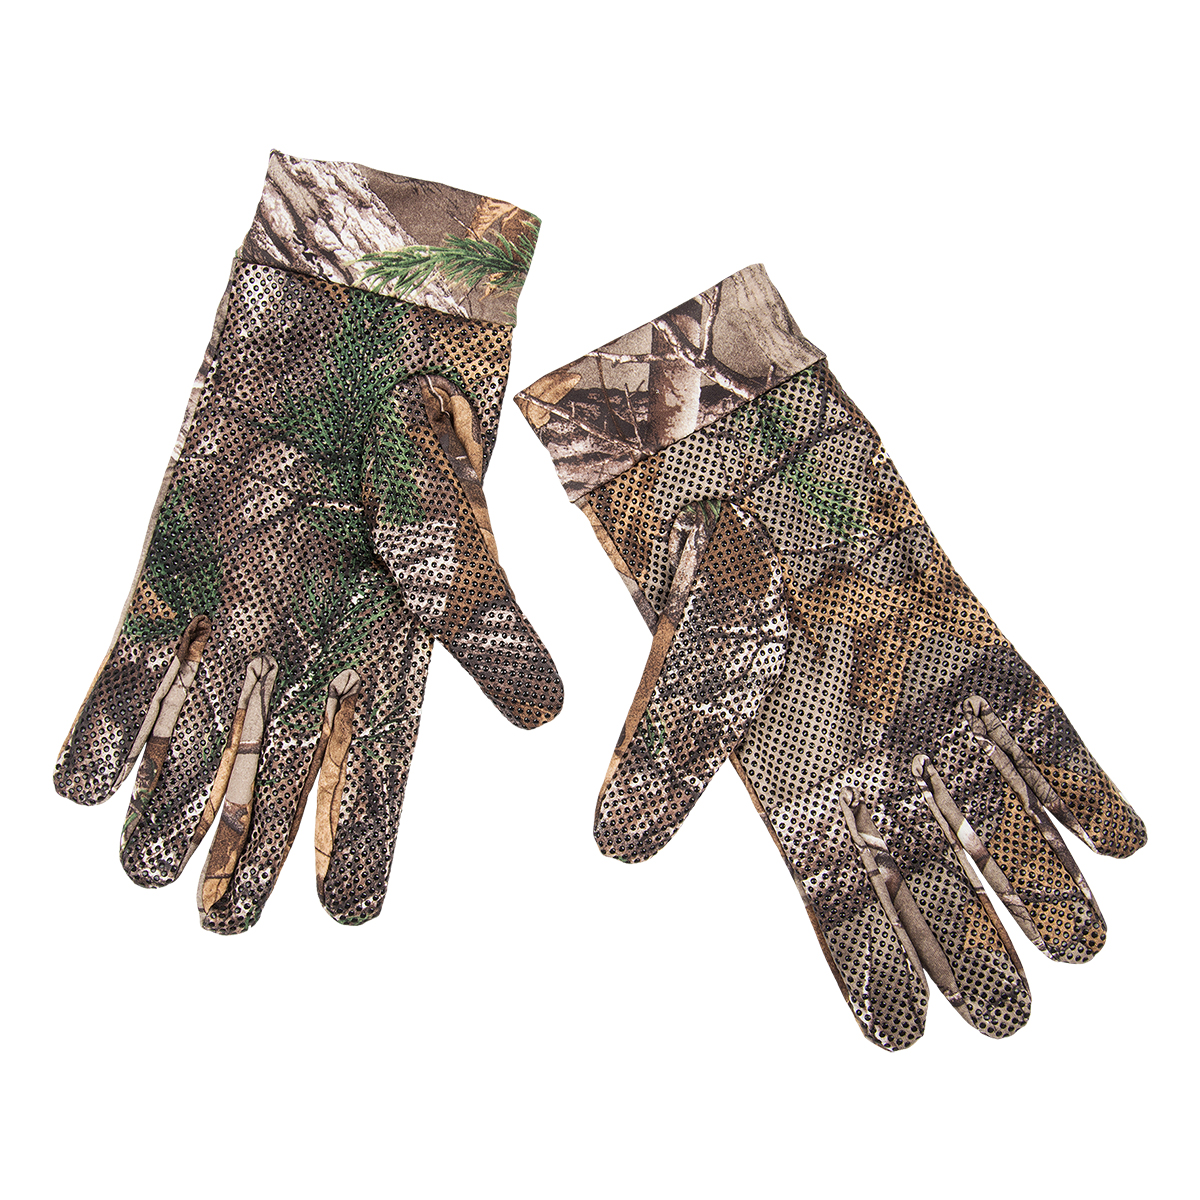 Pinewood Handschuhe Camou im Pareyshop